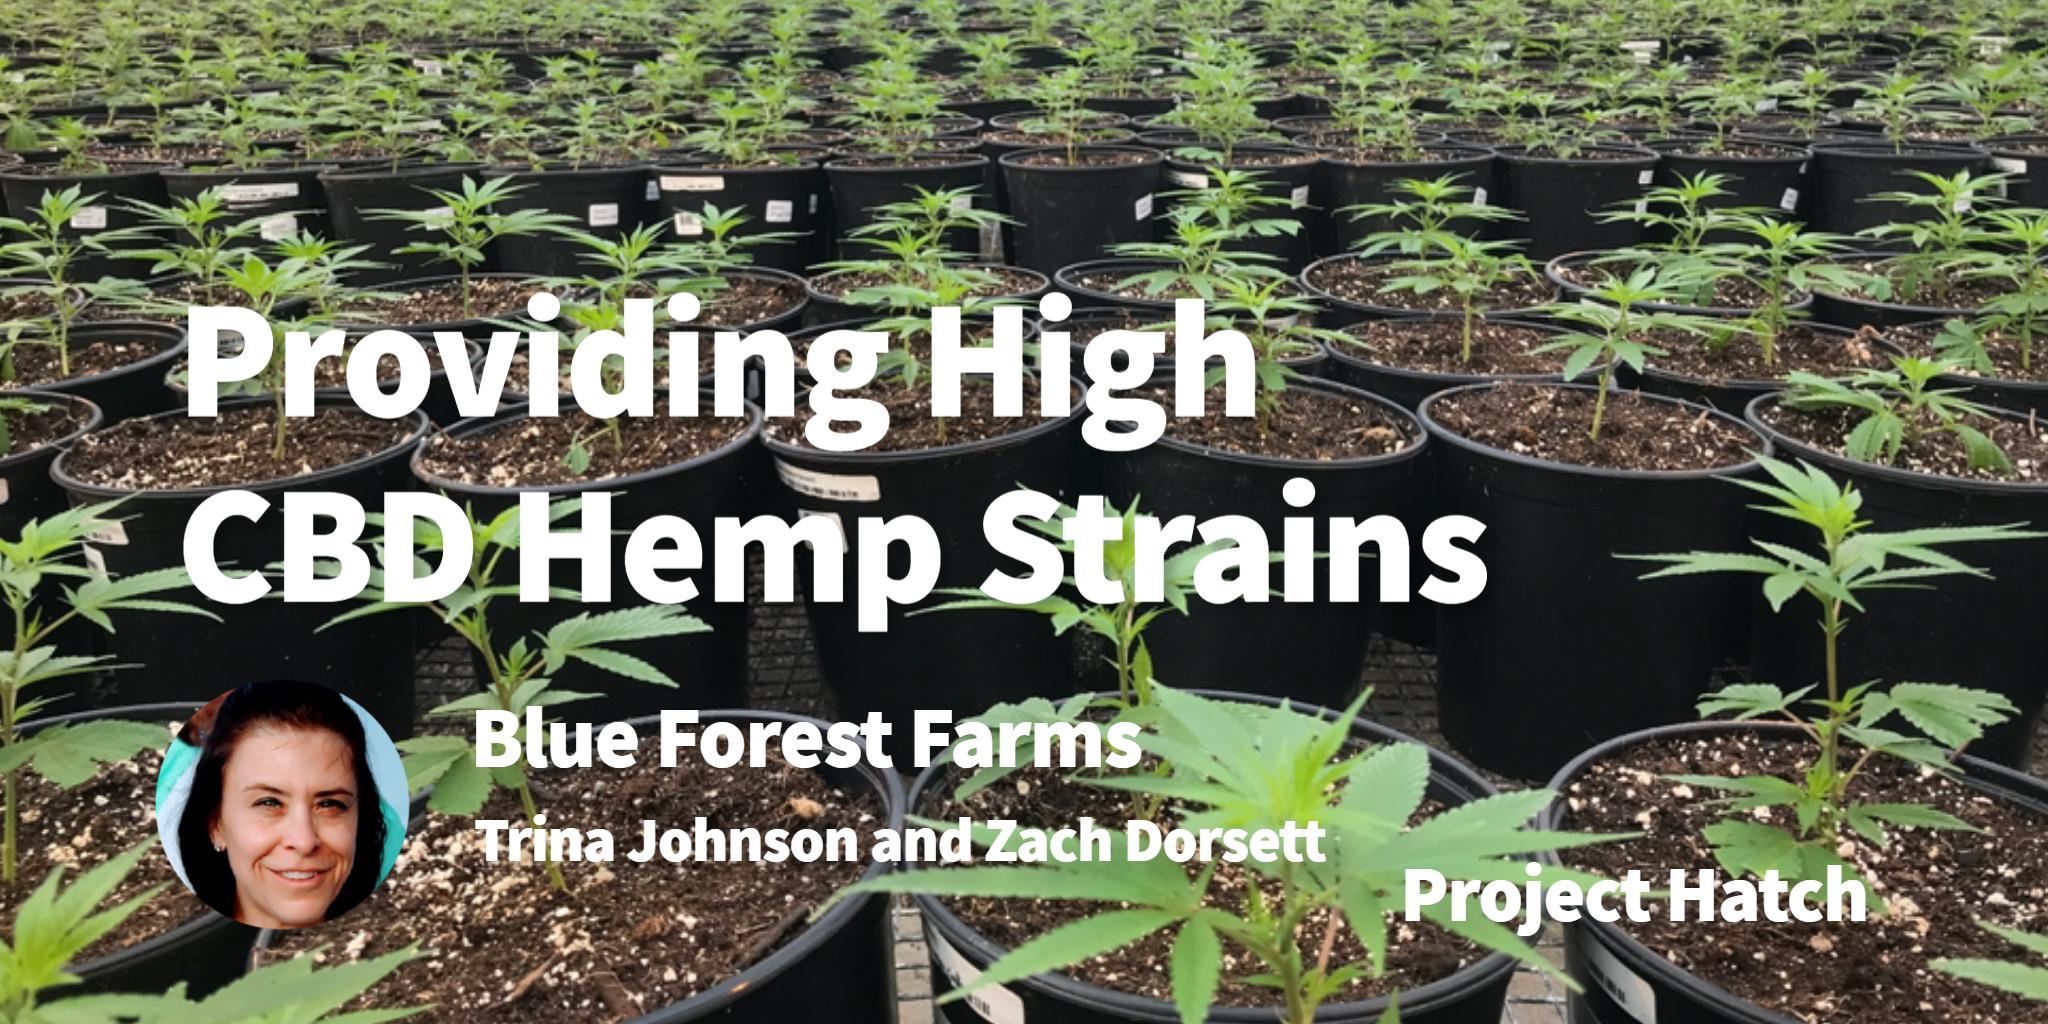 Blue Forest Farms Trina Johnson and Zach Dorsett